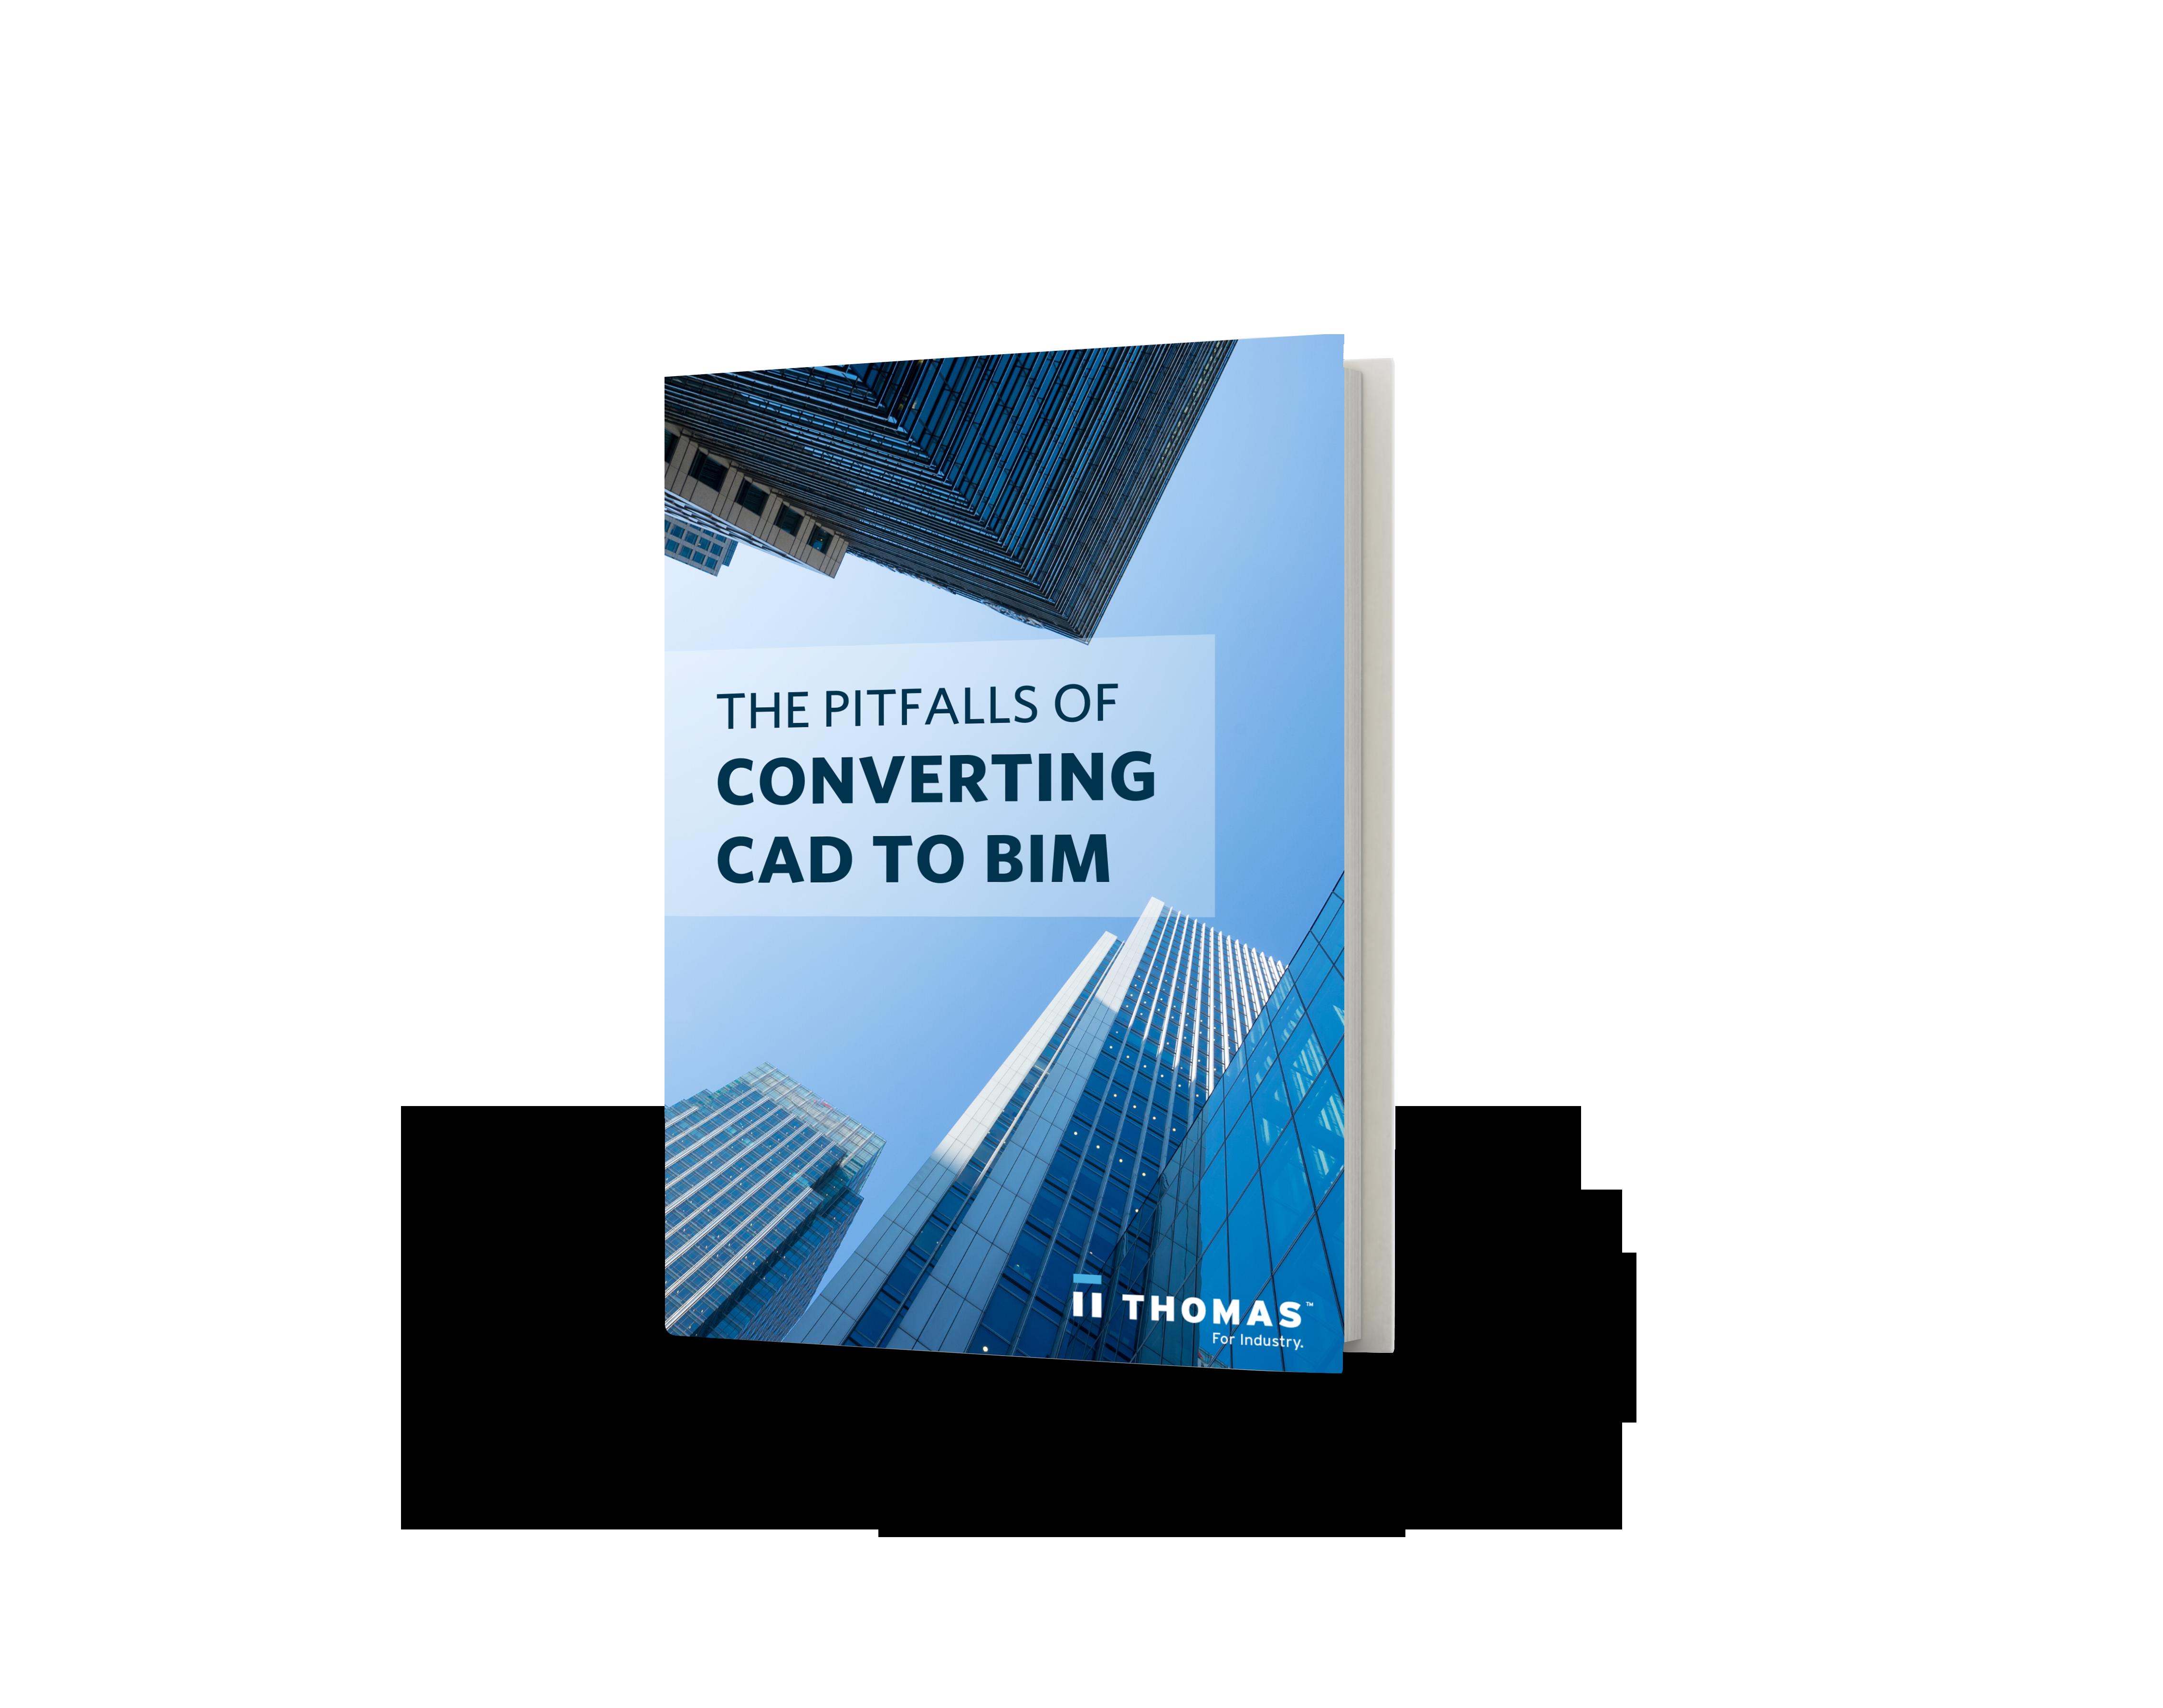 The Pitfalls Of Converting CAD To BIM